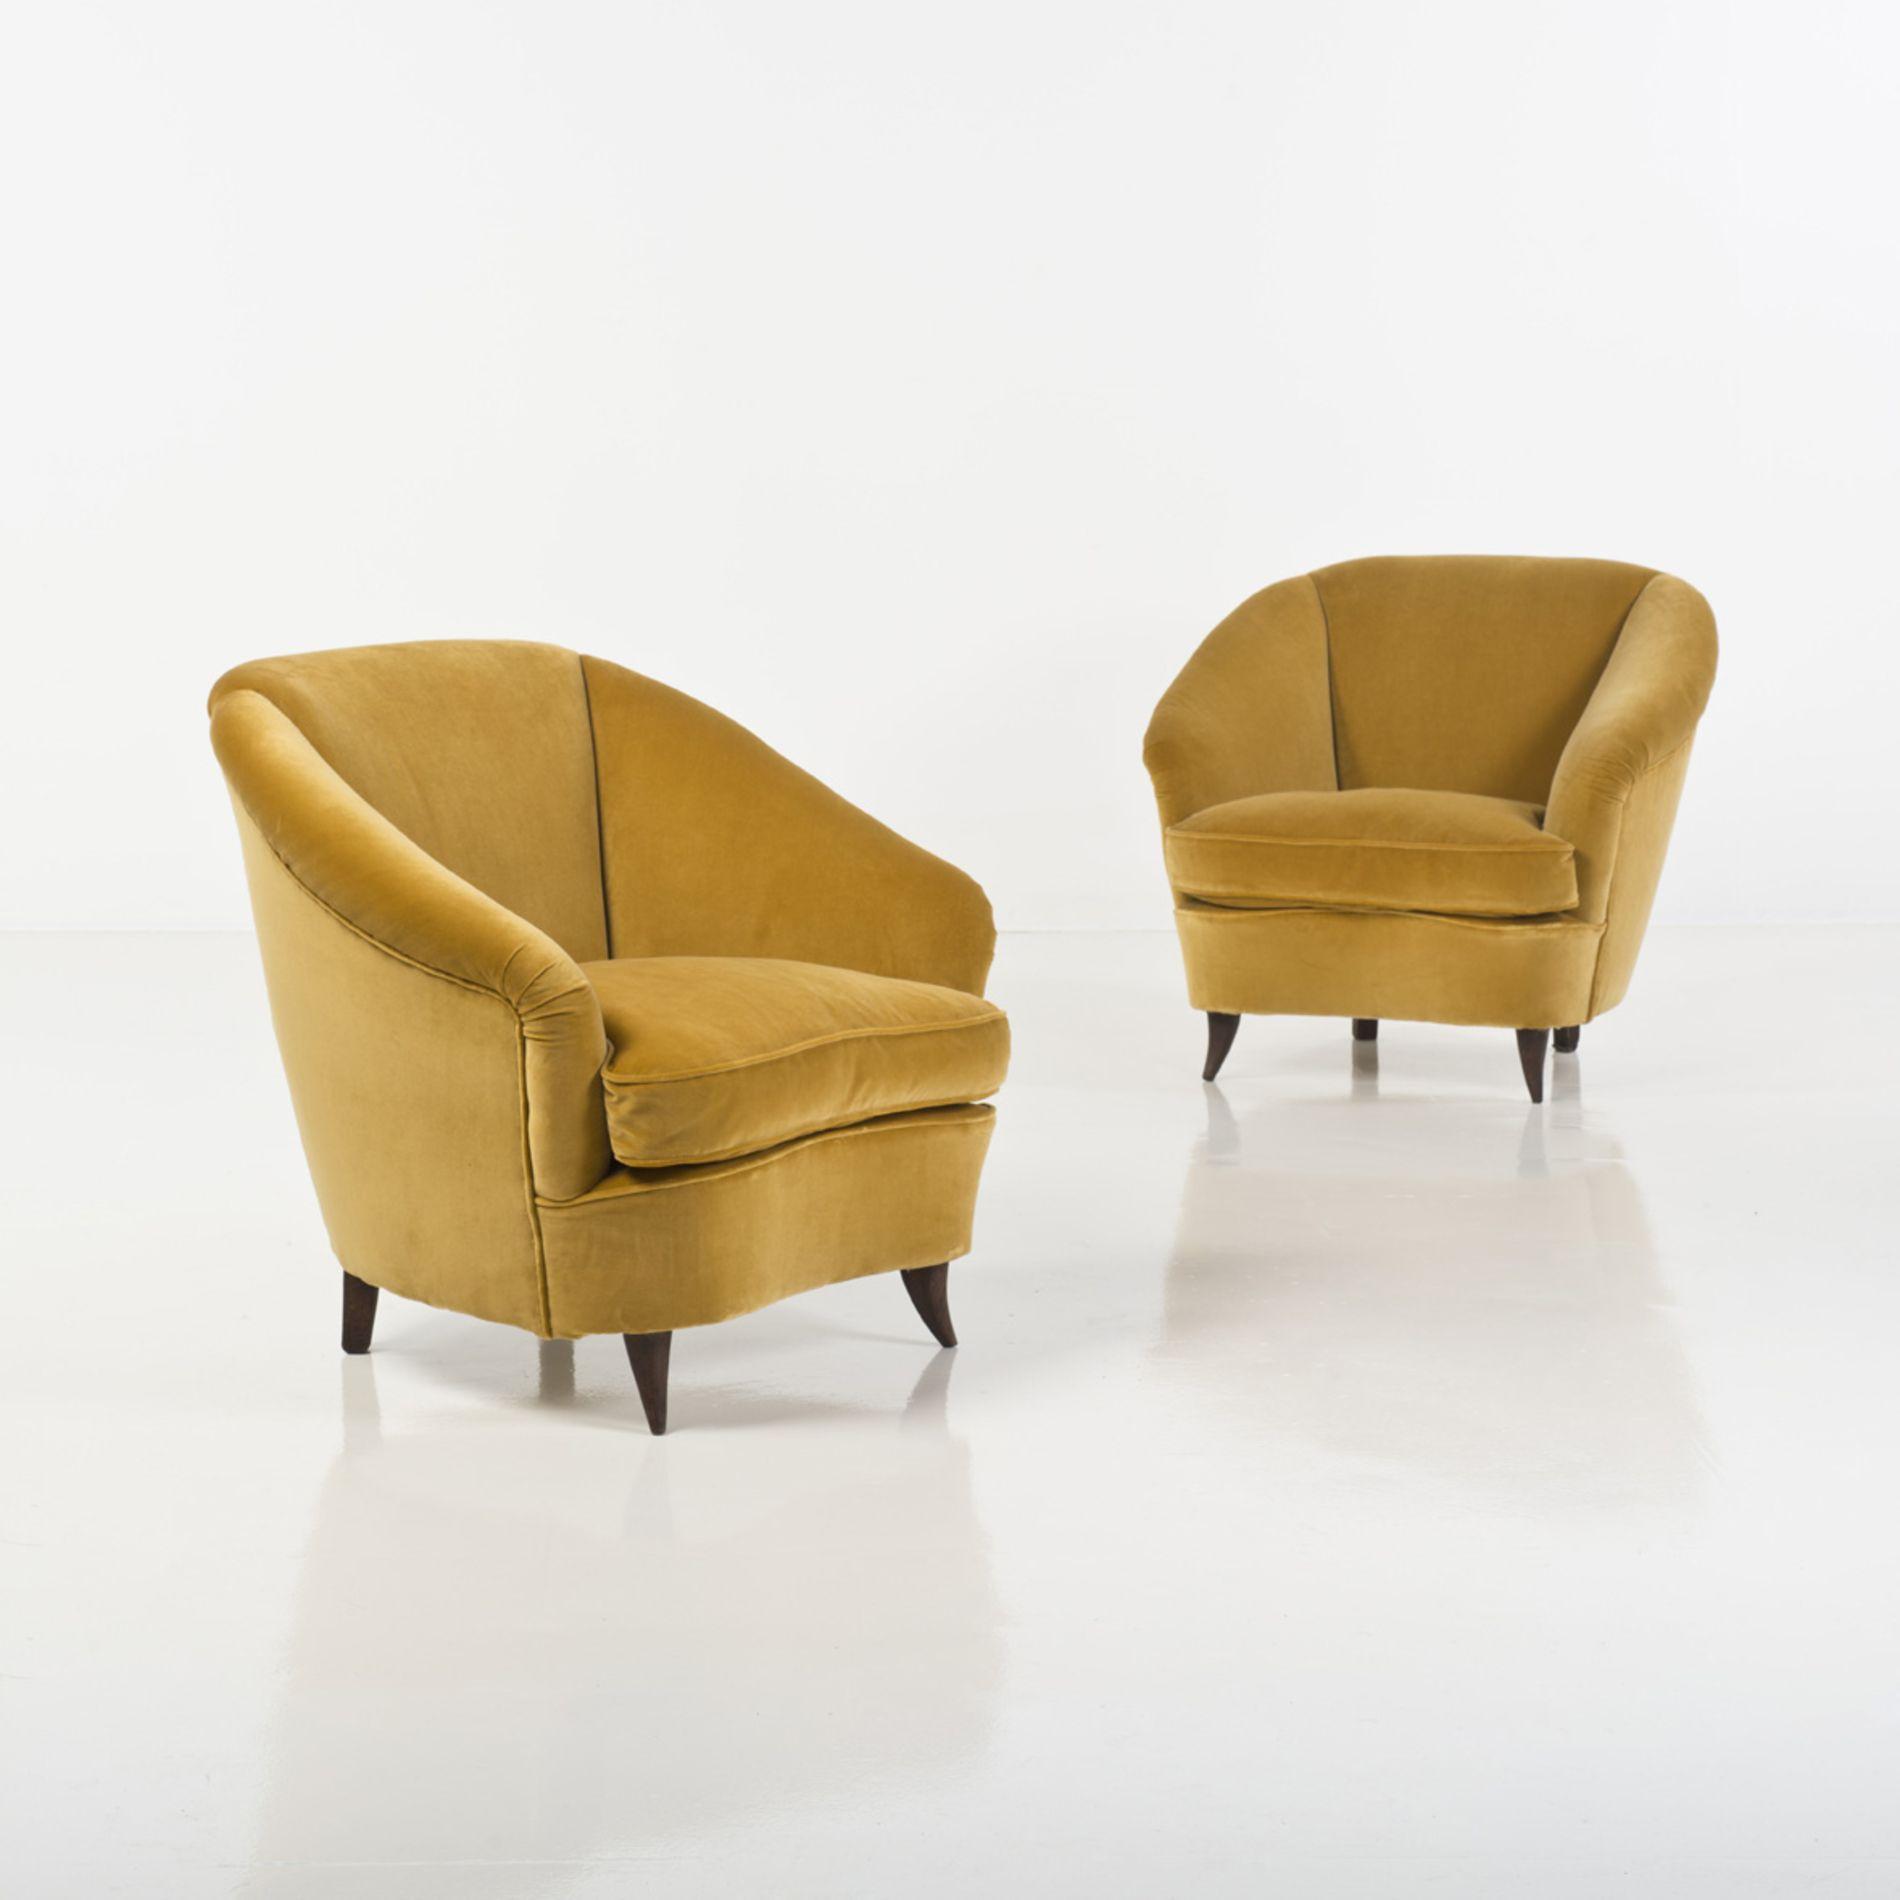 1938 Casa E Giardino Gio Ponti Chair Pinterest Decoraci N # Muebles Gio Ponti